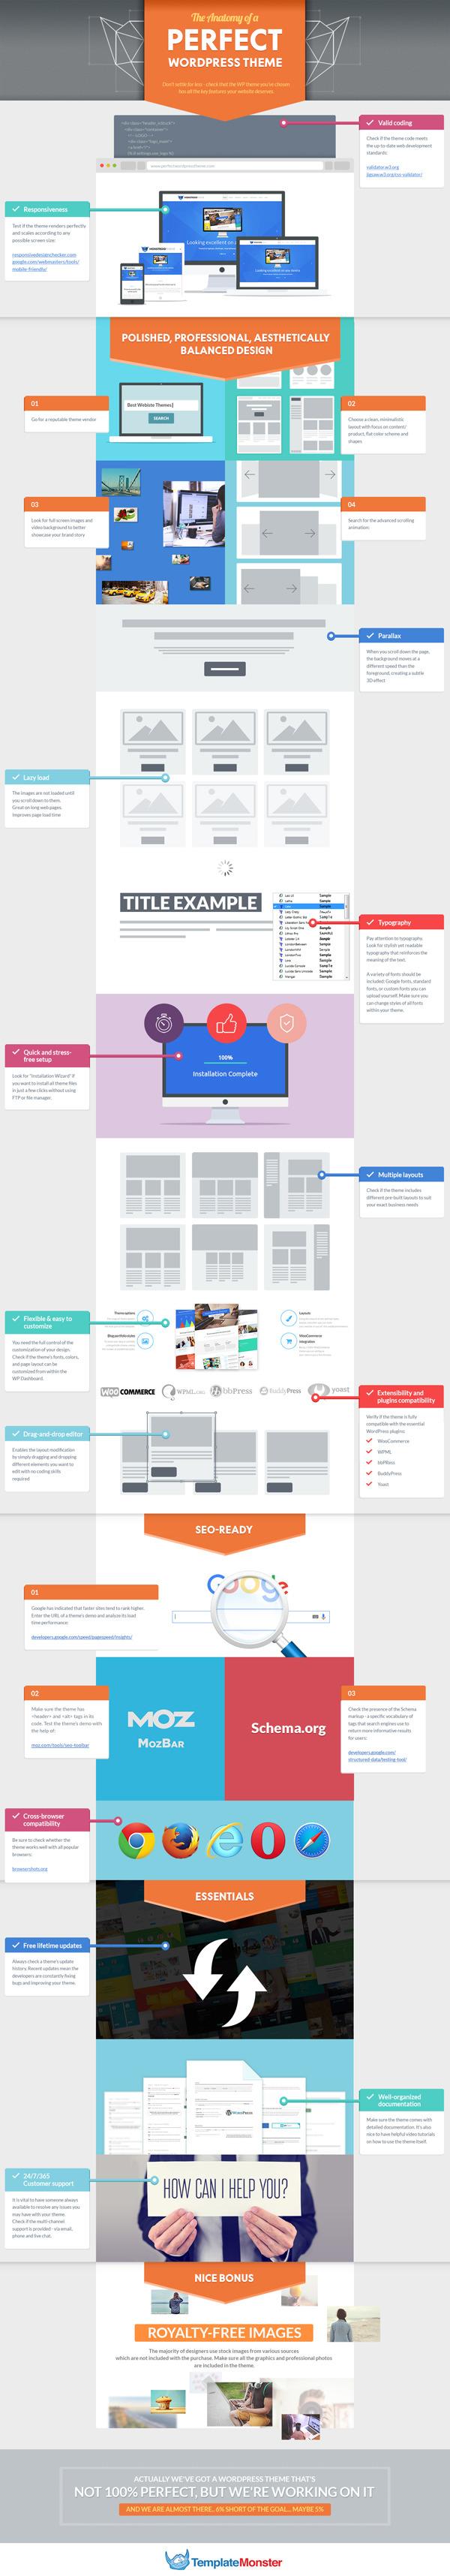 The Anatomy of a Perfect WordPress Theme